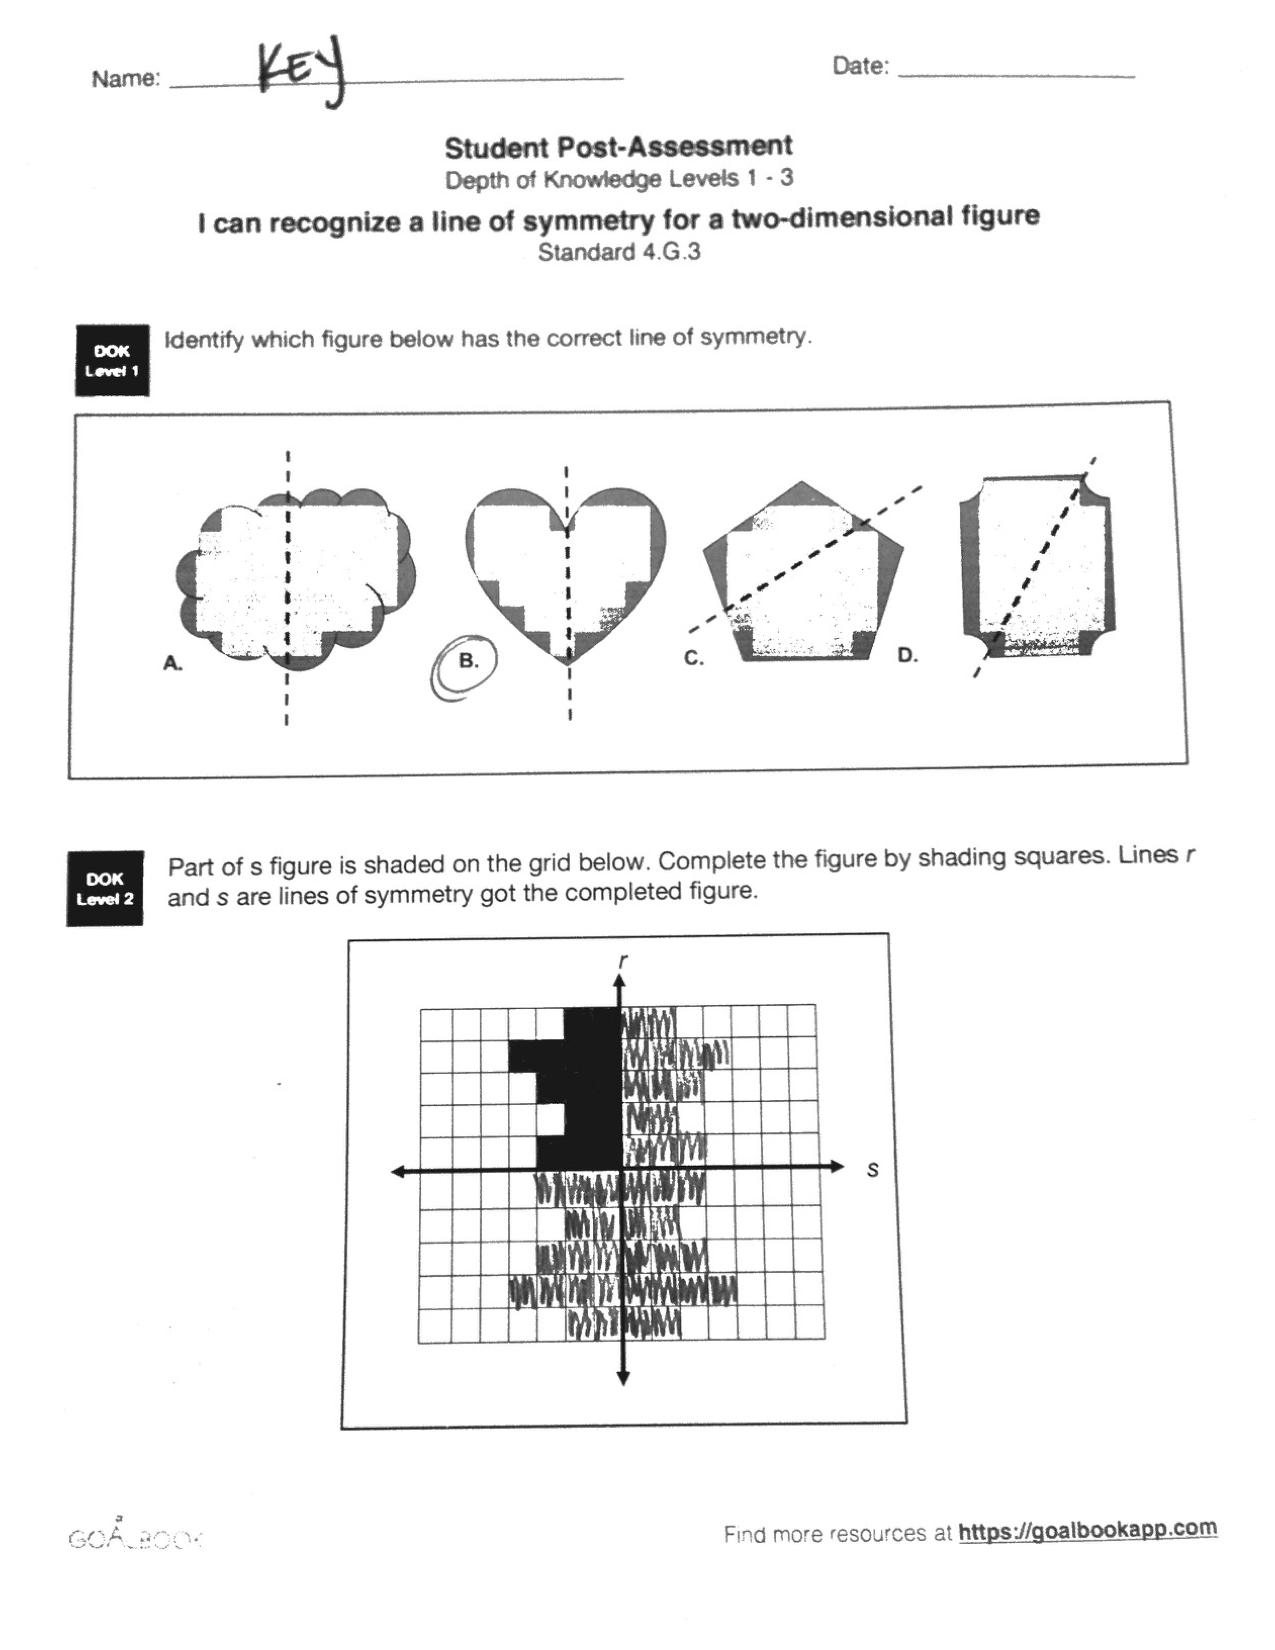 4 G 3 Line Of Symmetry